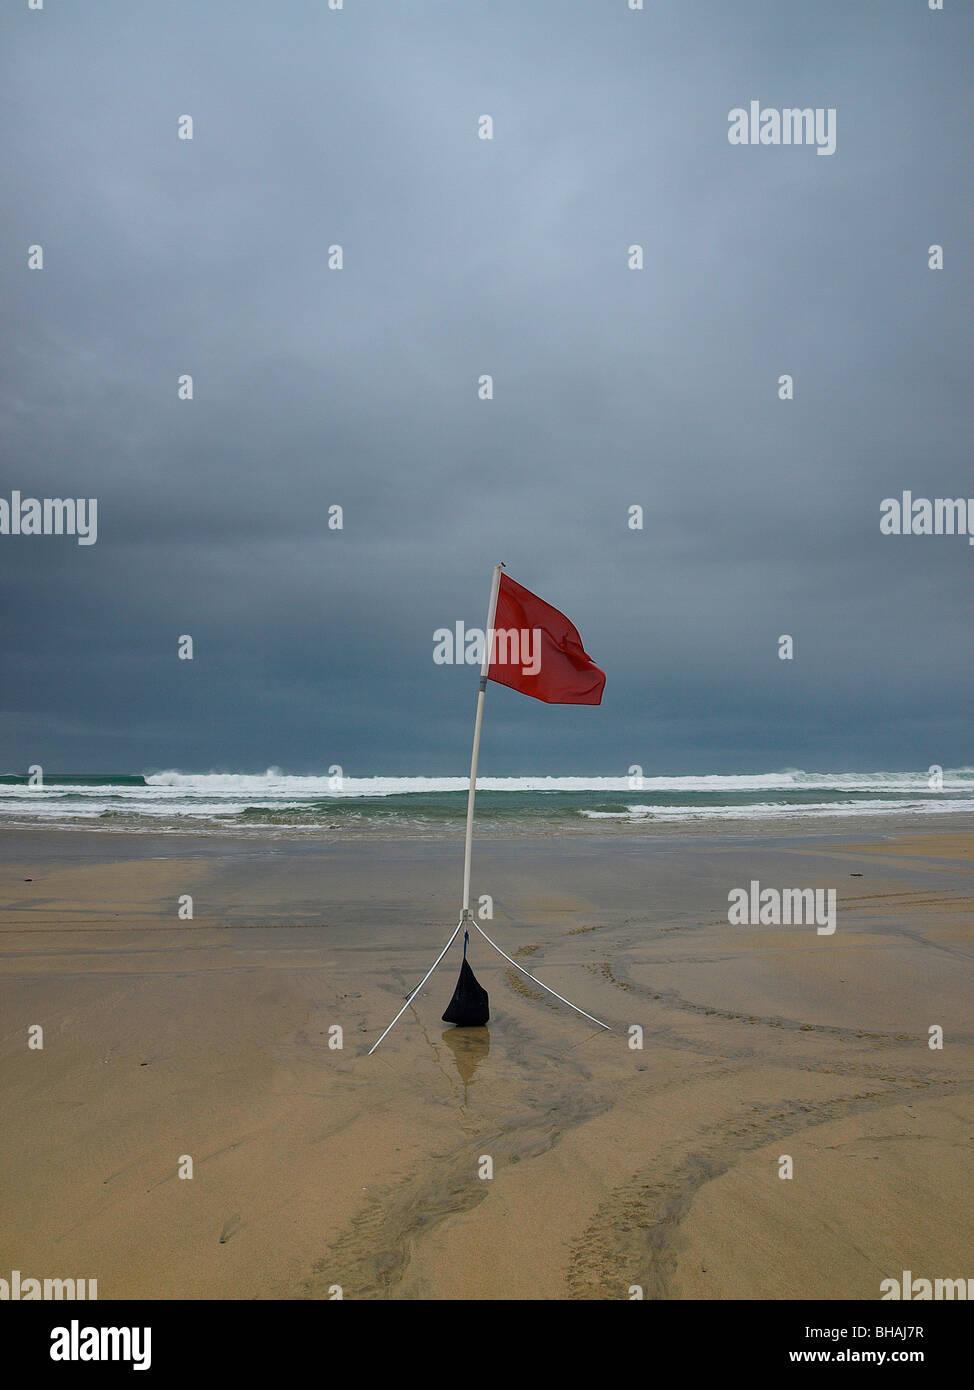 Unsafe bathing flag, Gwithian Towans, Cornwall, UK - Stock Image